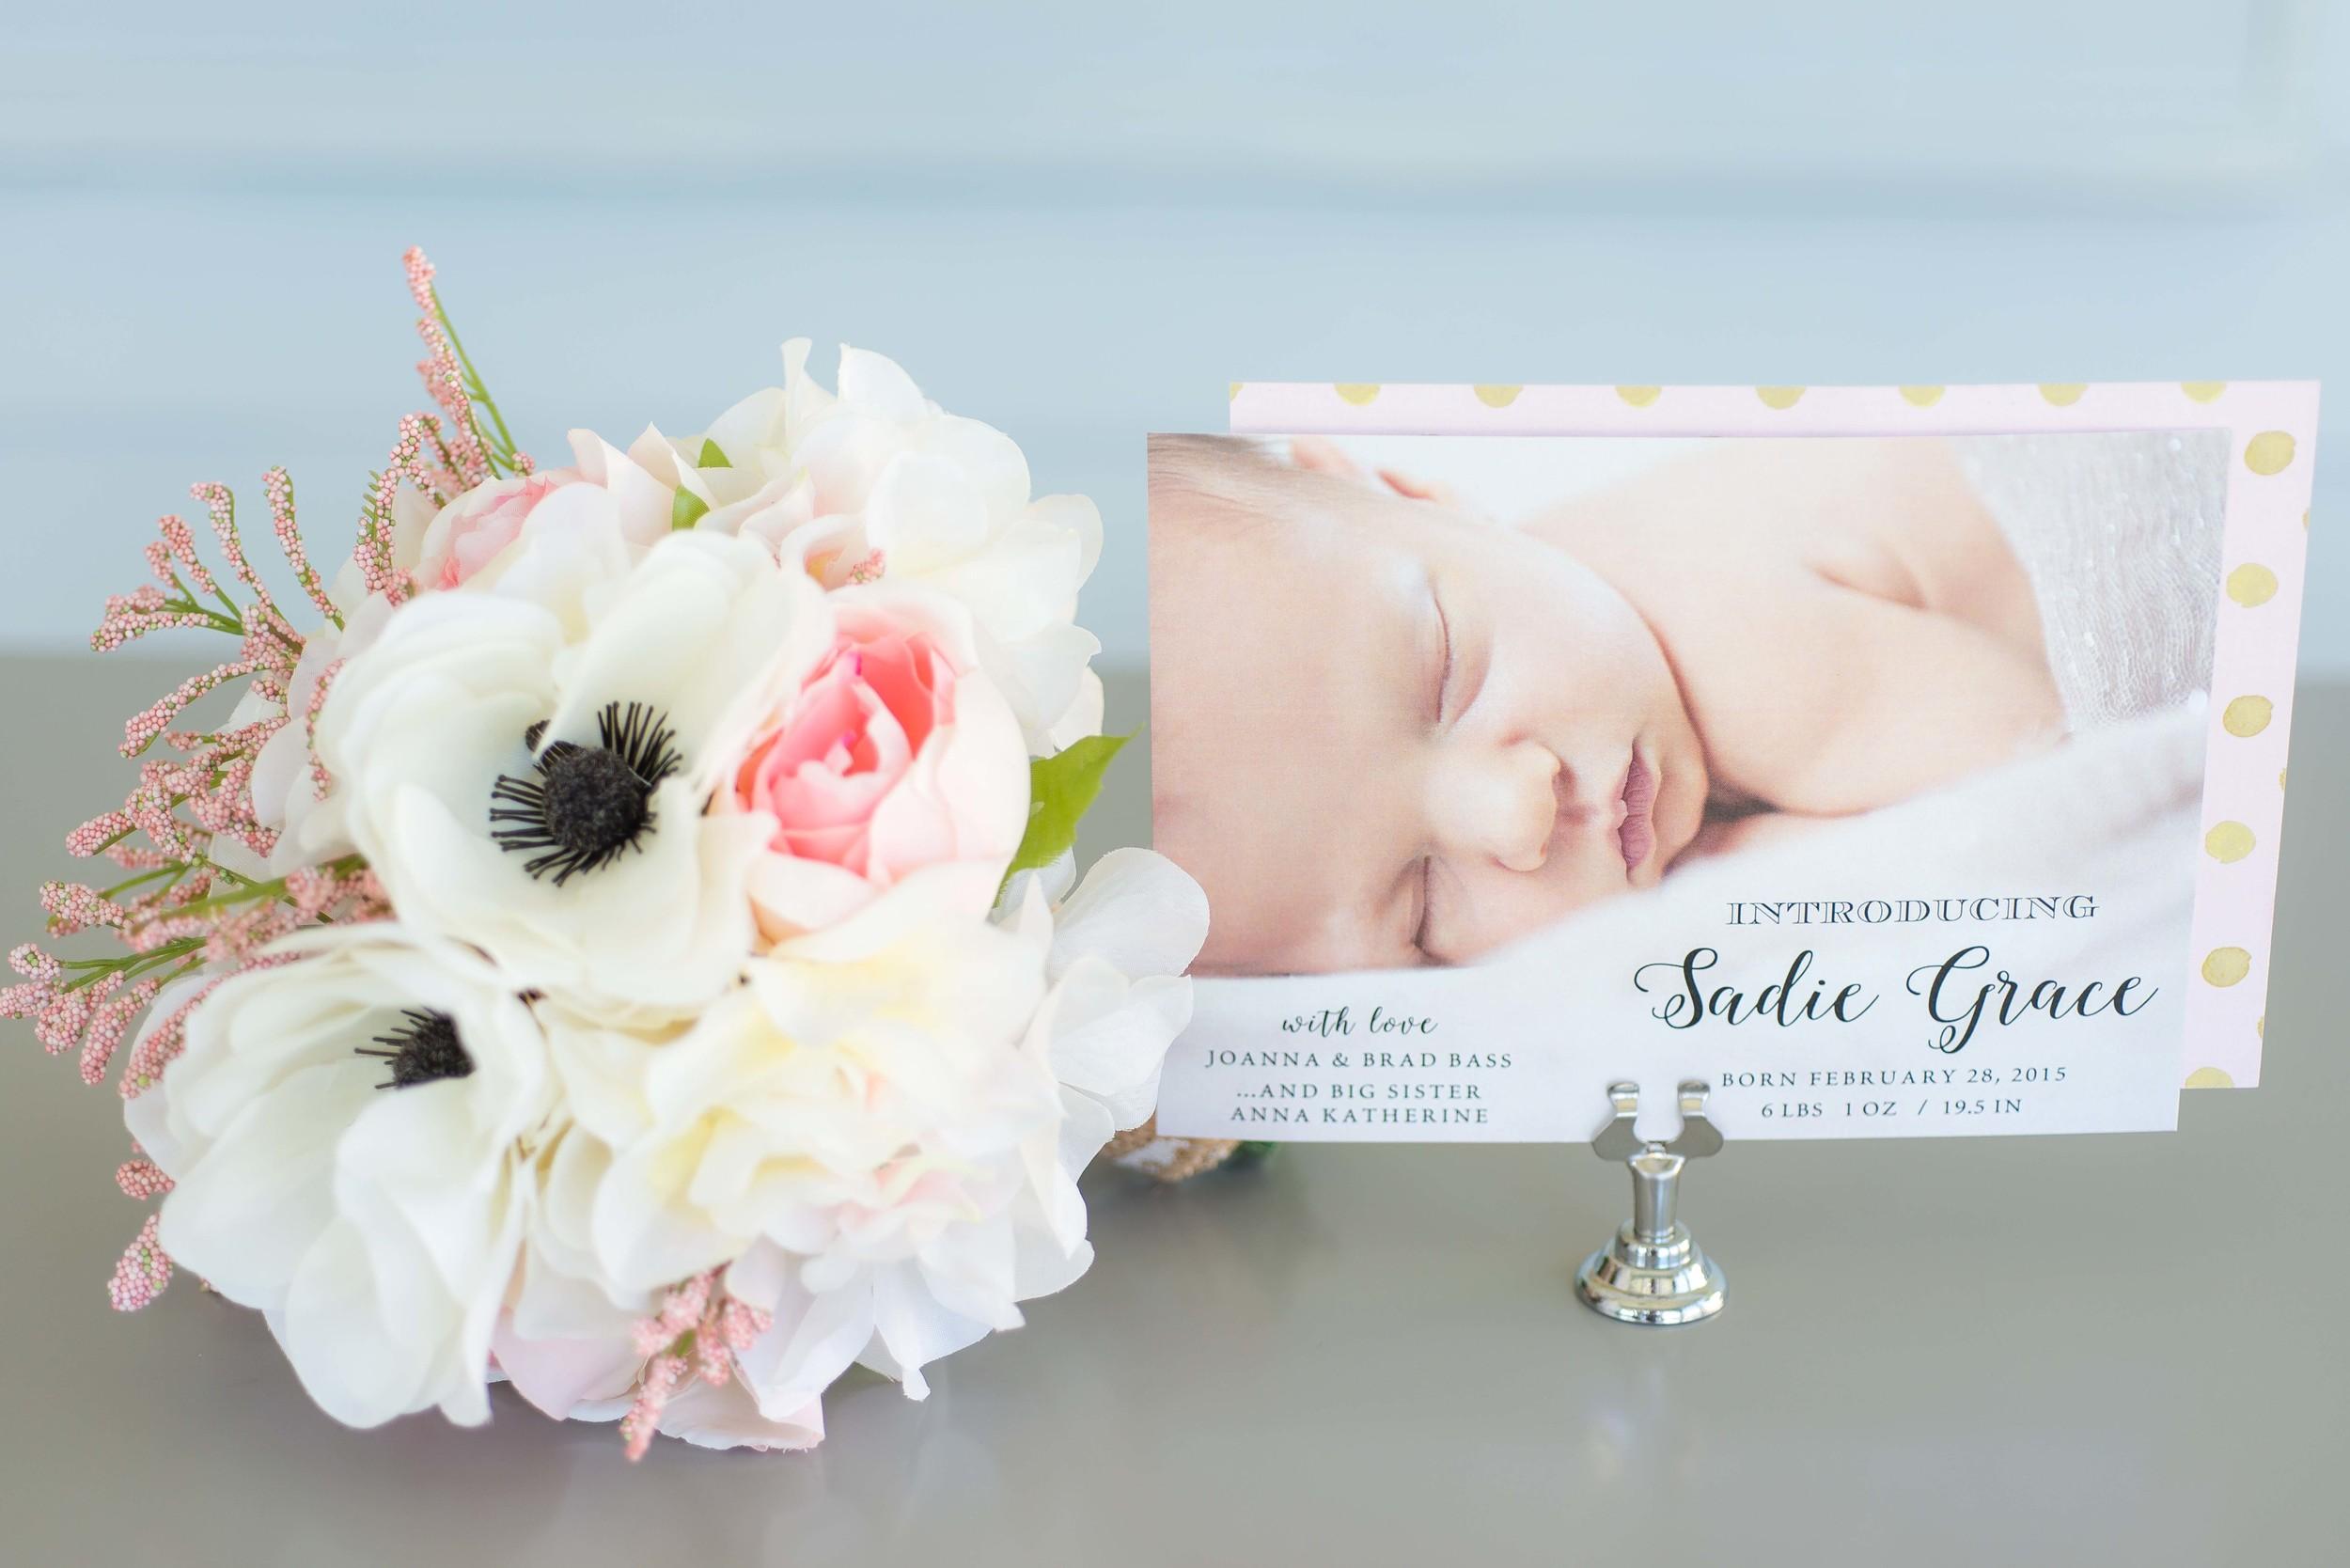 Custom Designed Baby Announcements